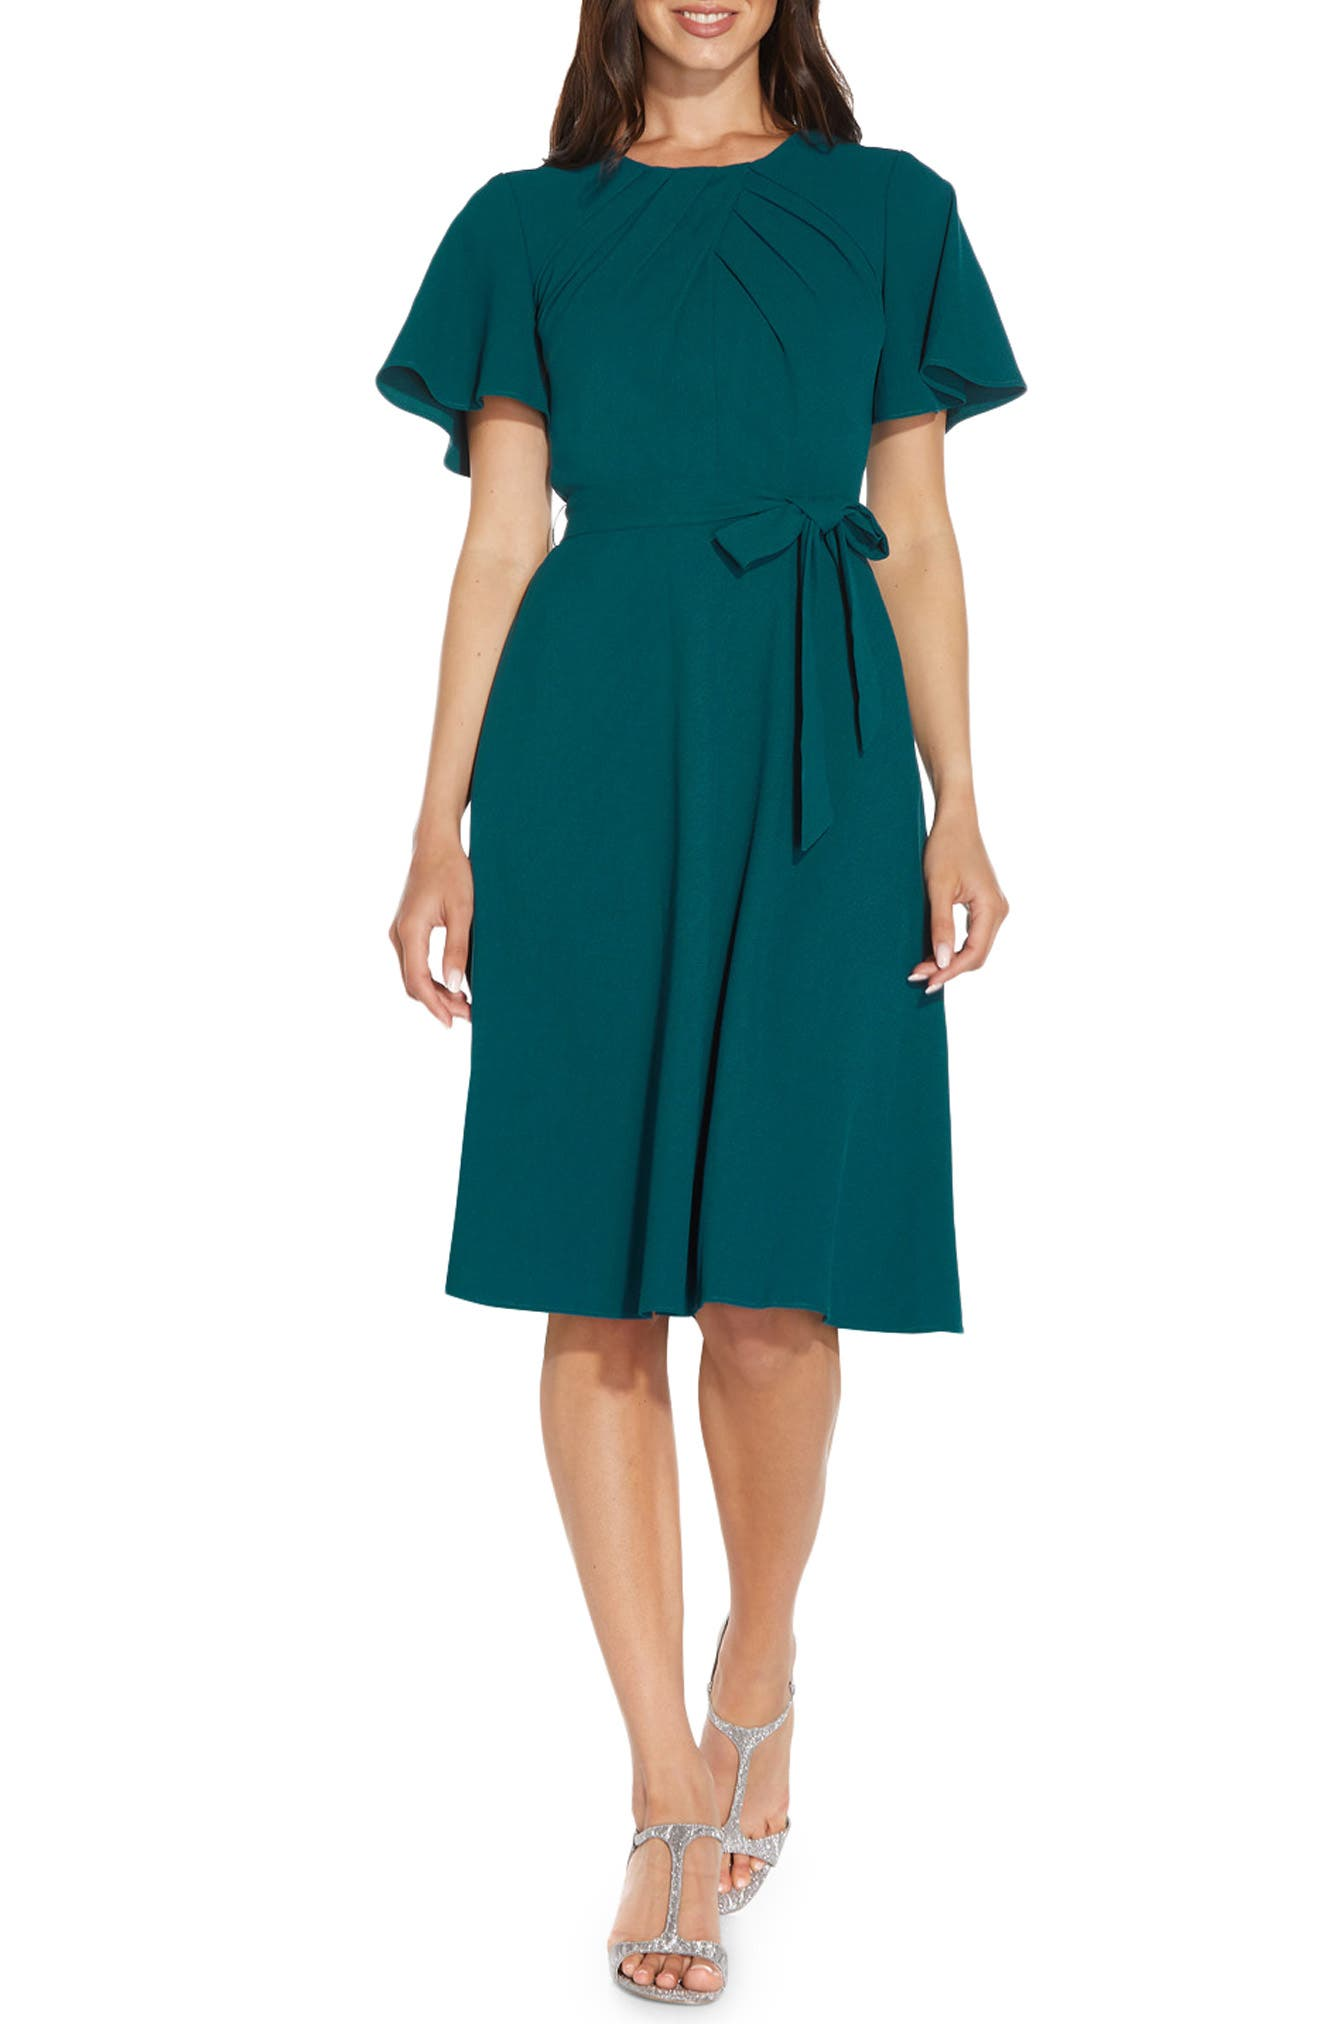 1940s Dresses   40s Dress, Swing Dress, Tea Dresses Womens Adrianna Papell Draped Divine Tie Waist Crepe A-Line Dress Size 14 - Bluegreen $149.00 AT vintagedancer.com